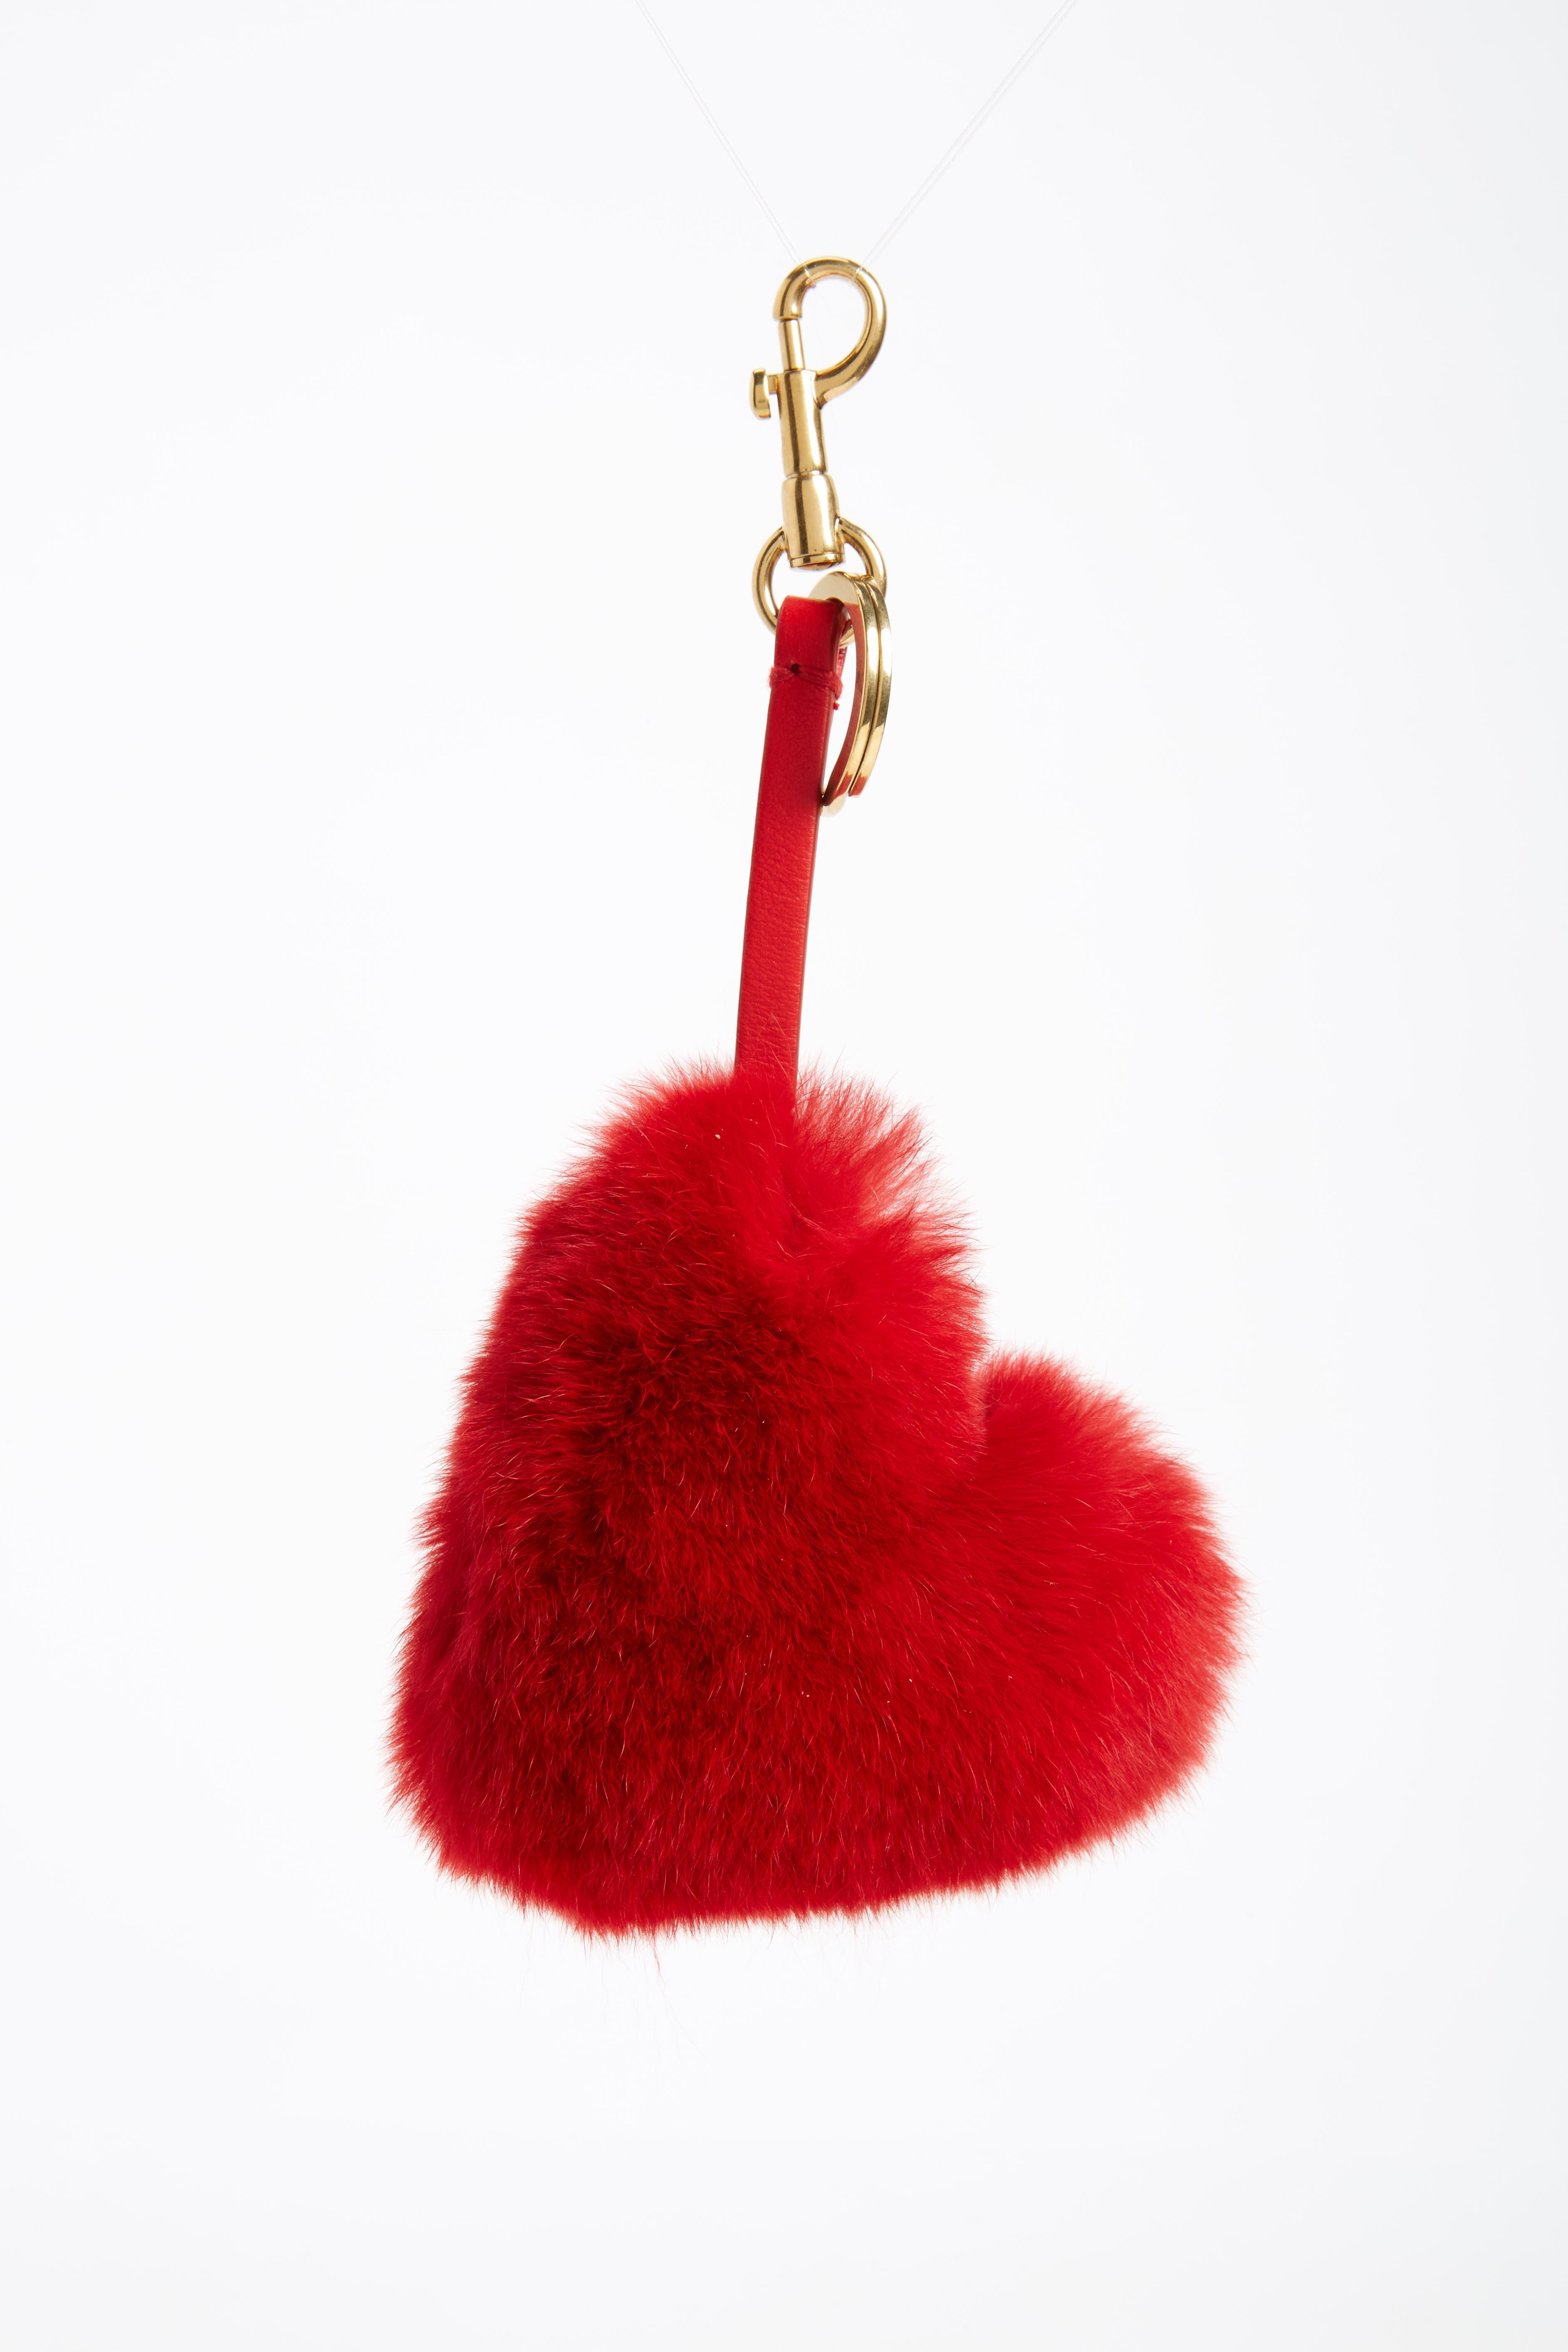 Main Image - Anya Hindmarch Heart Genuine Rabbit Fur Bag Charm